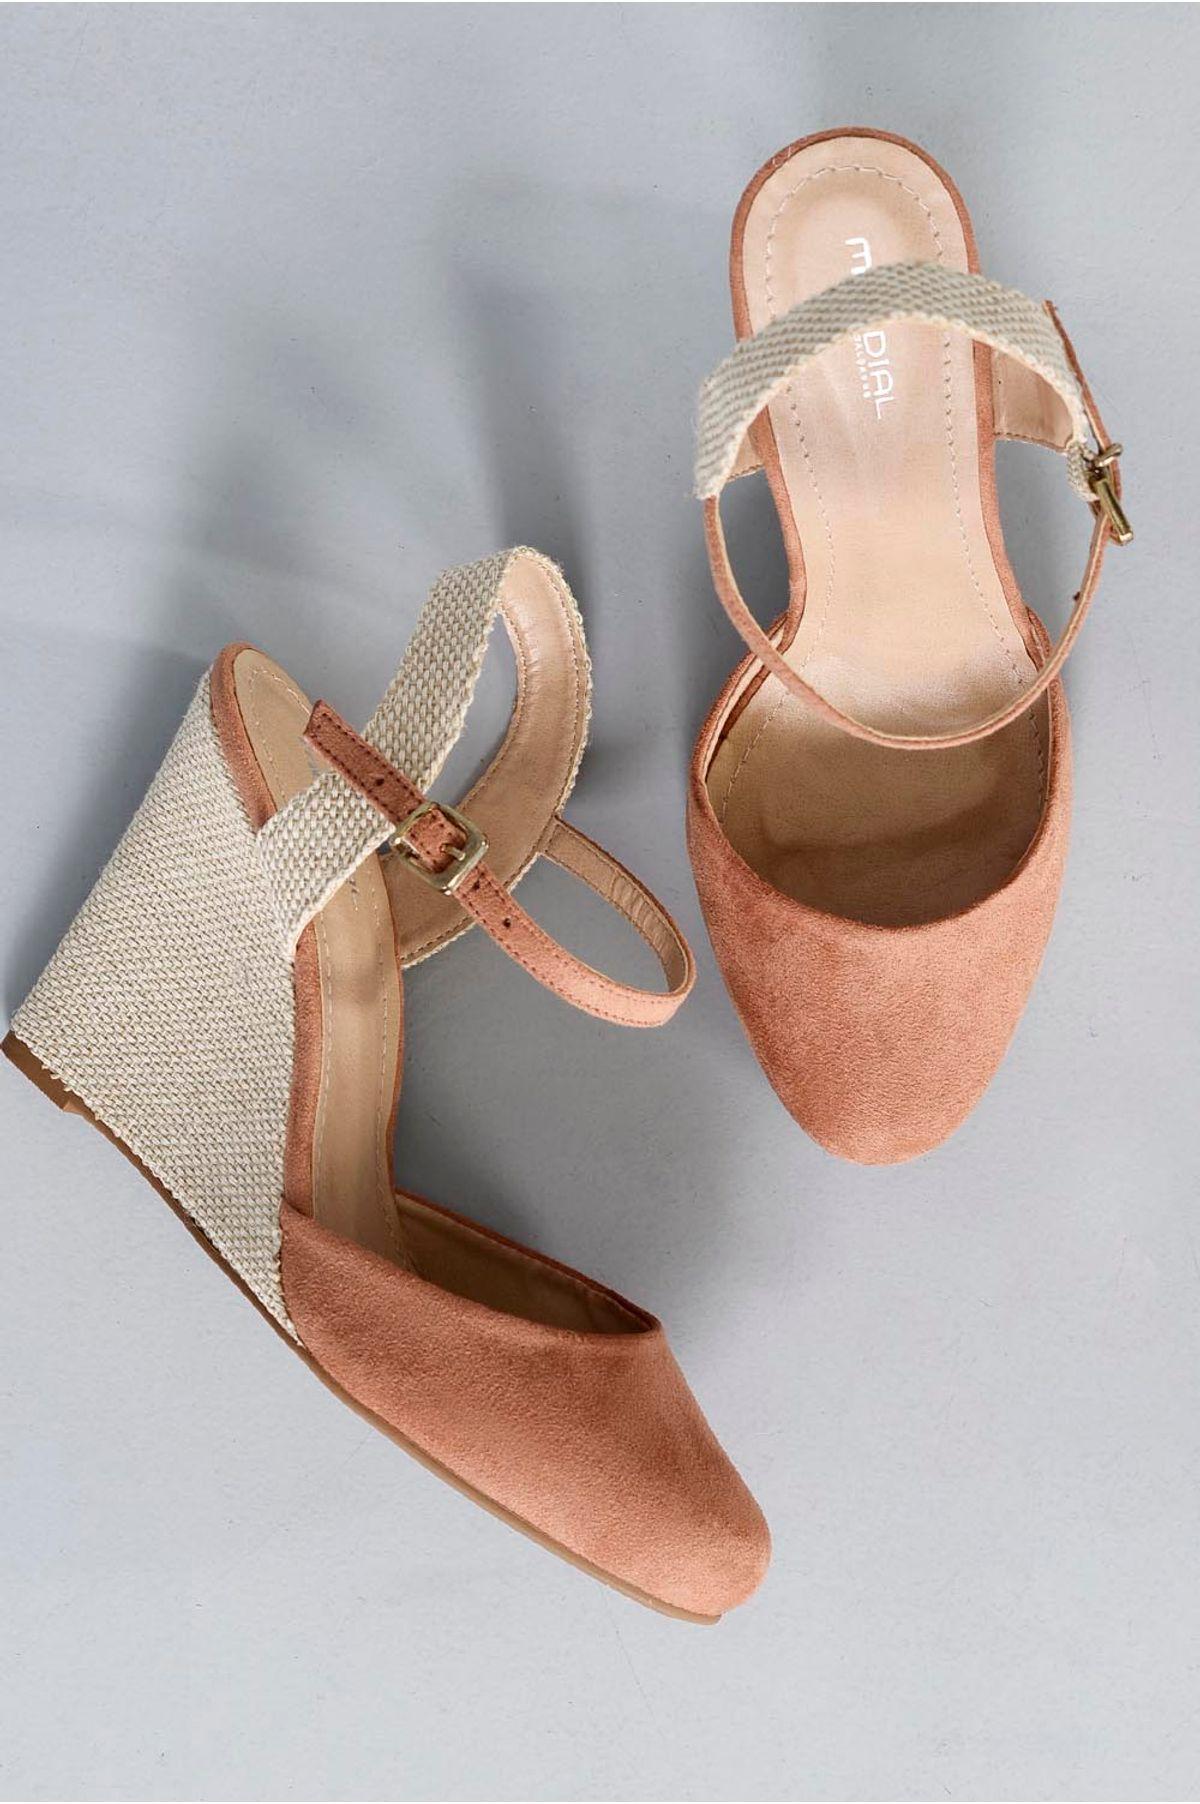 2feee5814 Sapato Feminino Anabela Leona Mundial   Mundial Calçados - Mundial ...